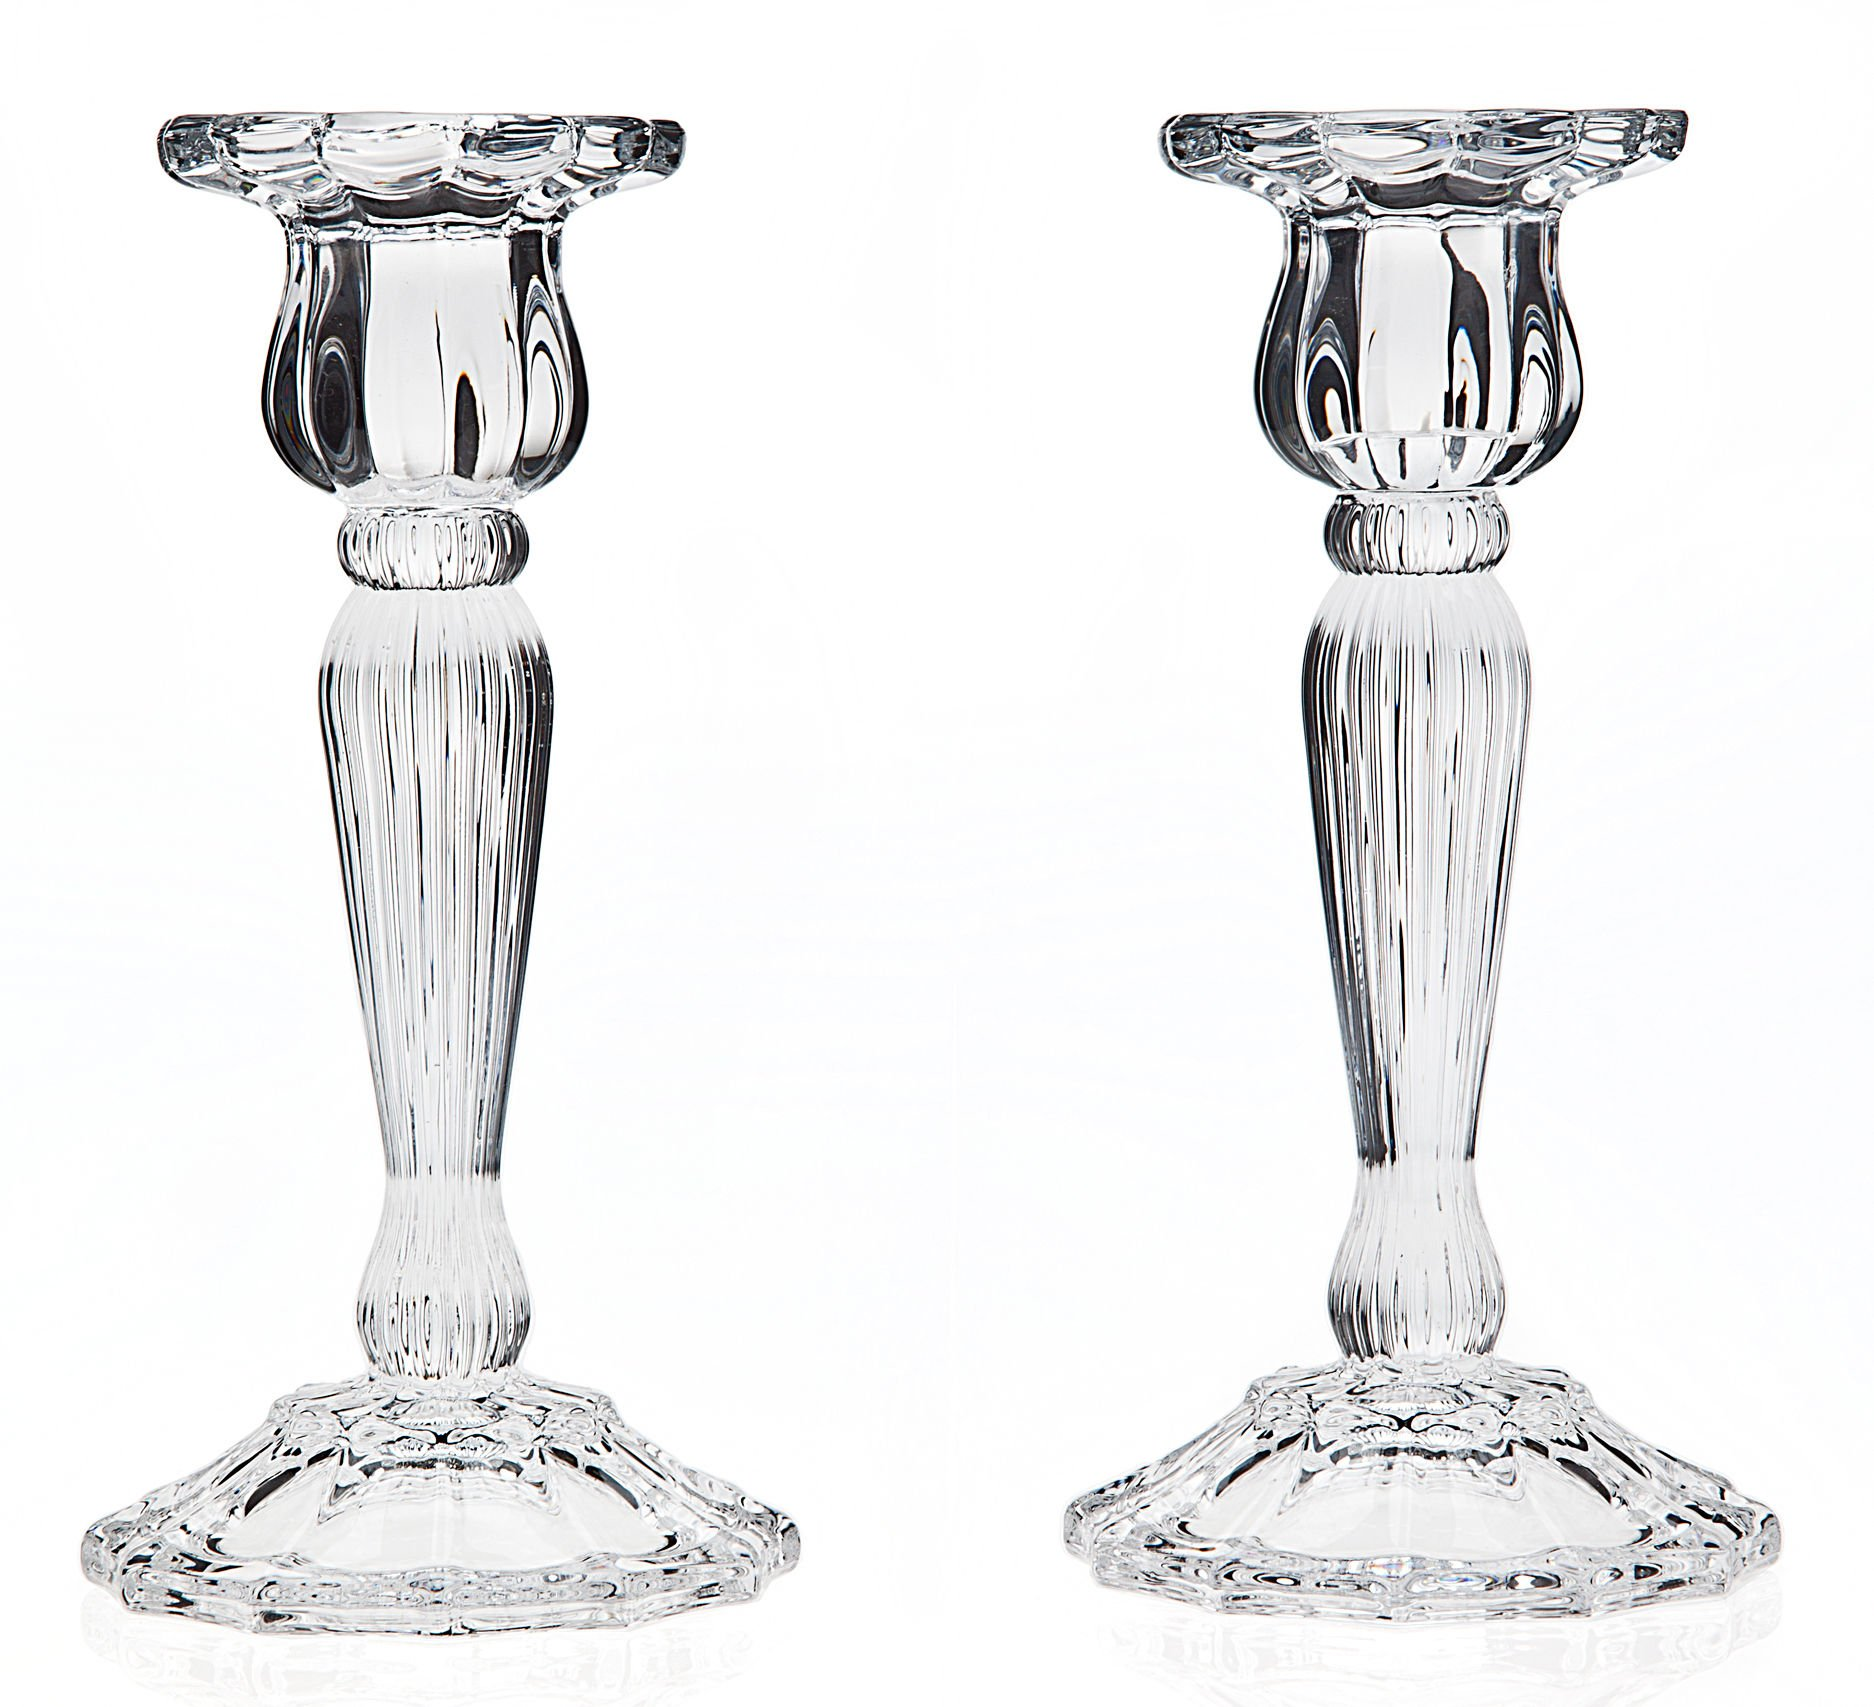 Godinger 2-pc. Triumph Crystal Candlestick Set